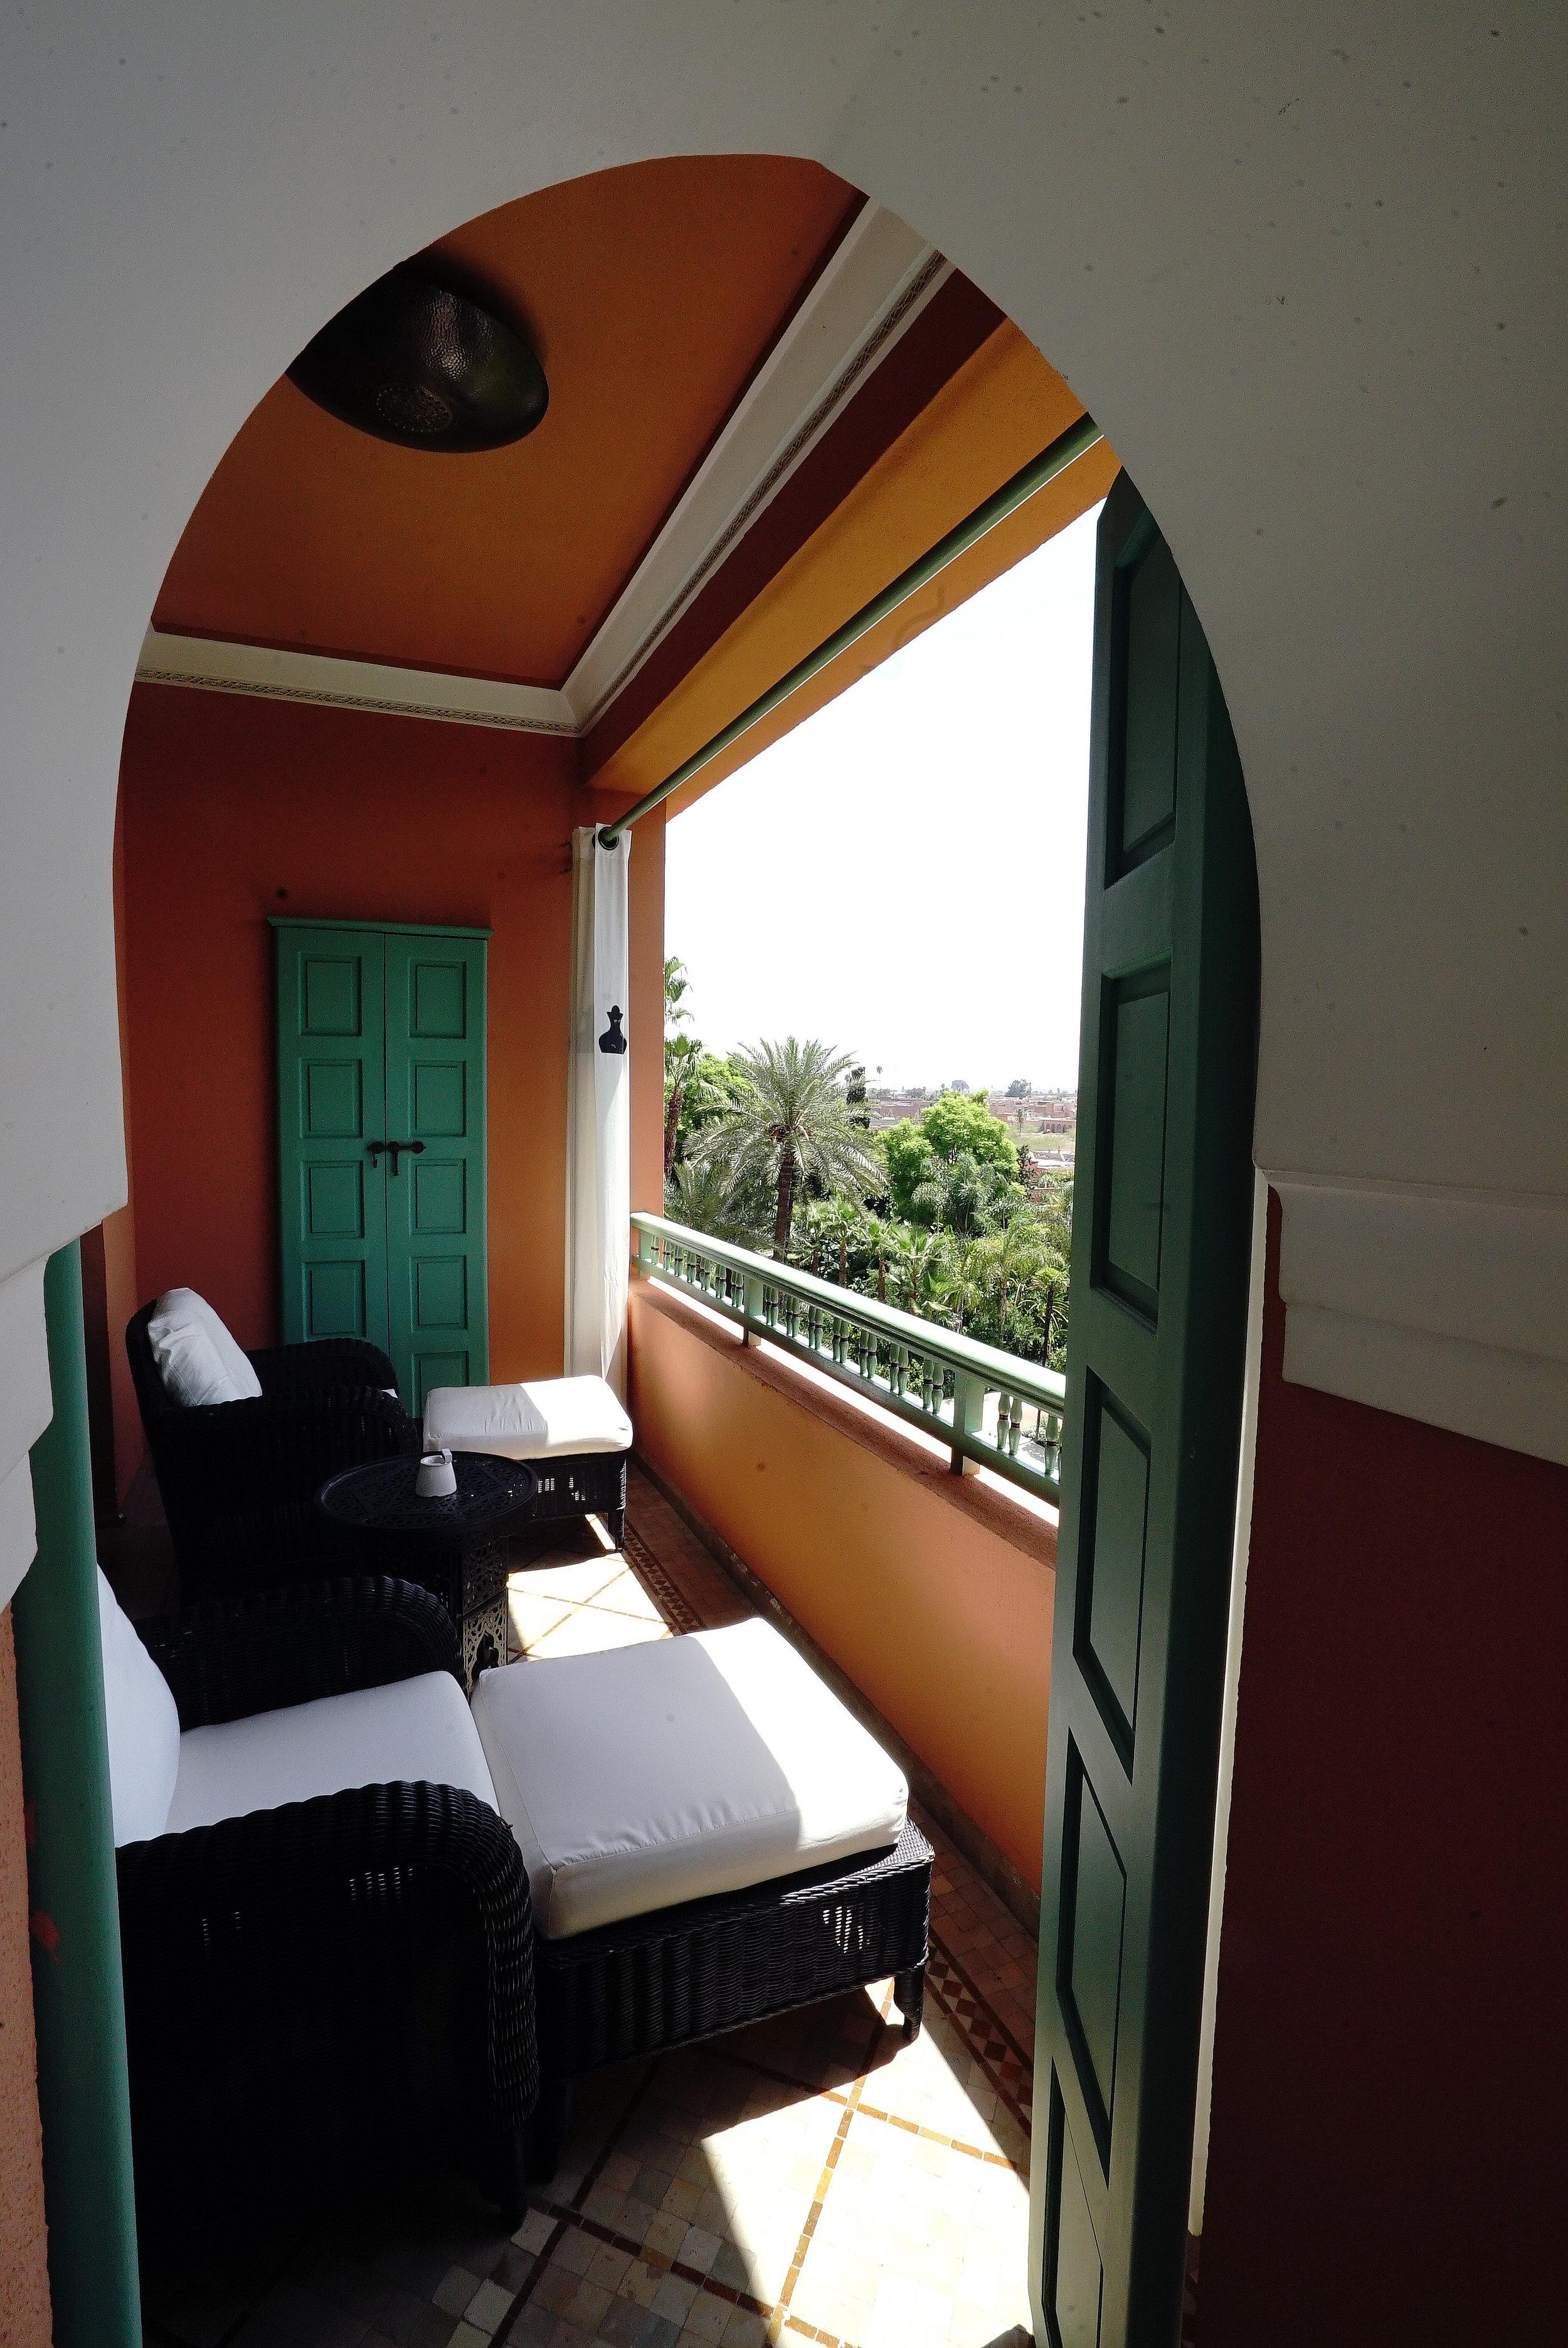 La Mamounia Morocco Room Balcony.jpg